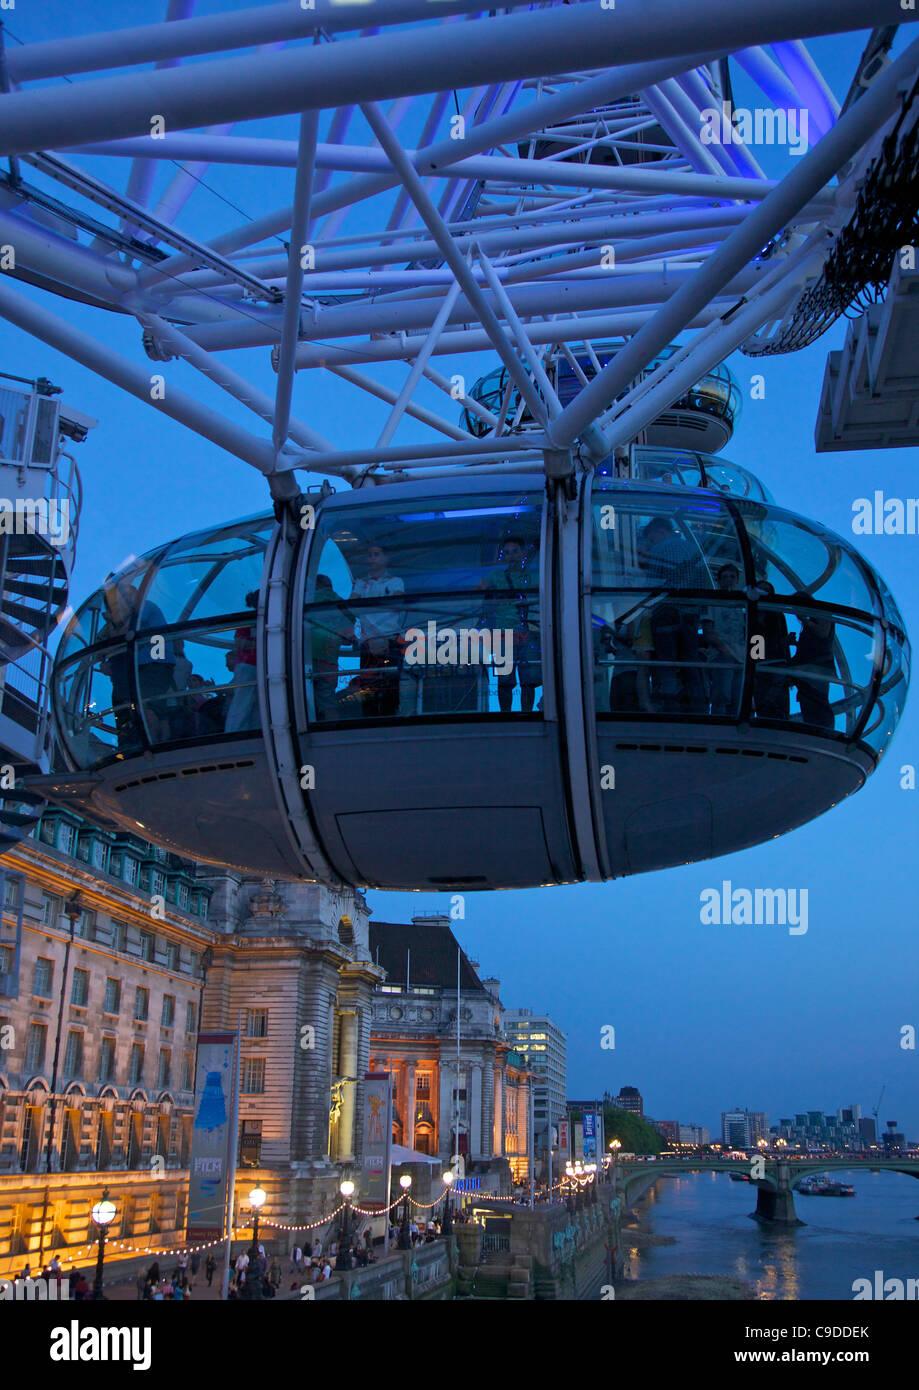 Blick auf Passagier Pod Kapsel des London Eye in der Abenddämmerung, South Bank, London, England, UK, Deutschland, Stockbild